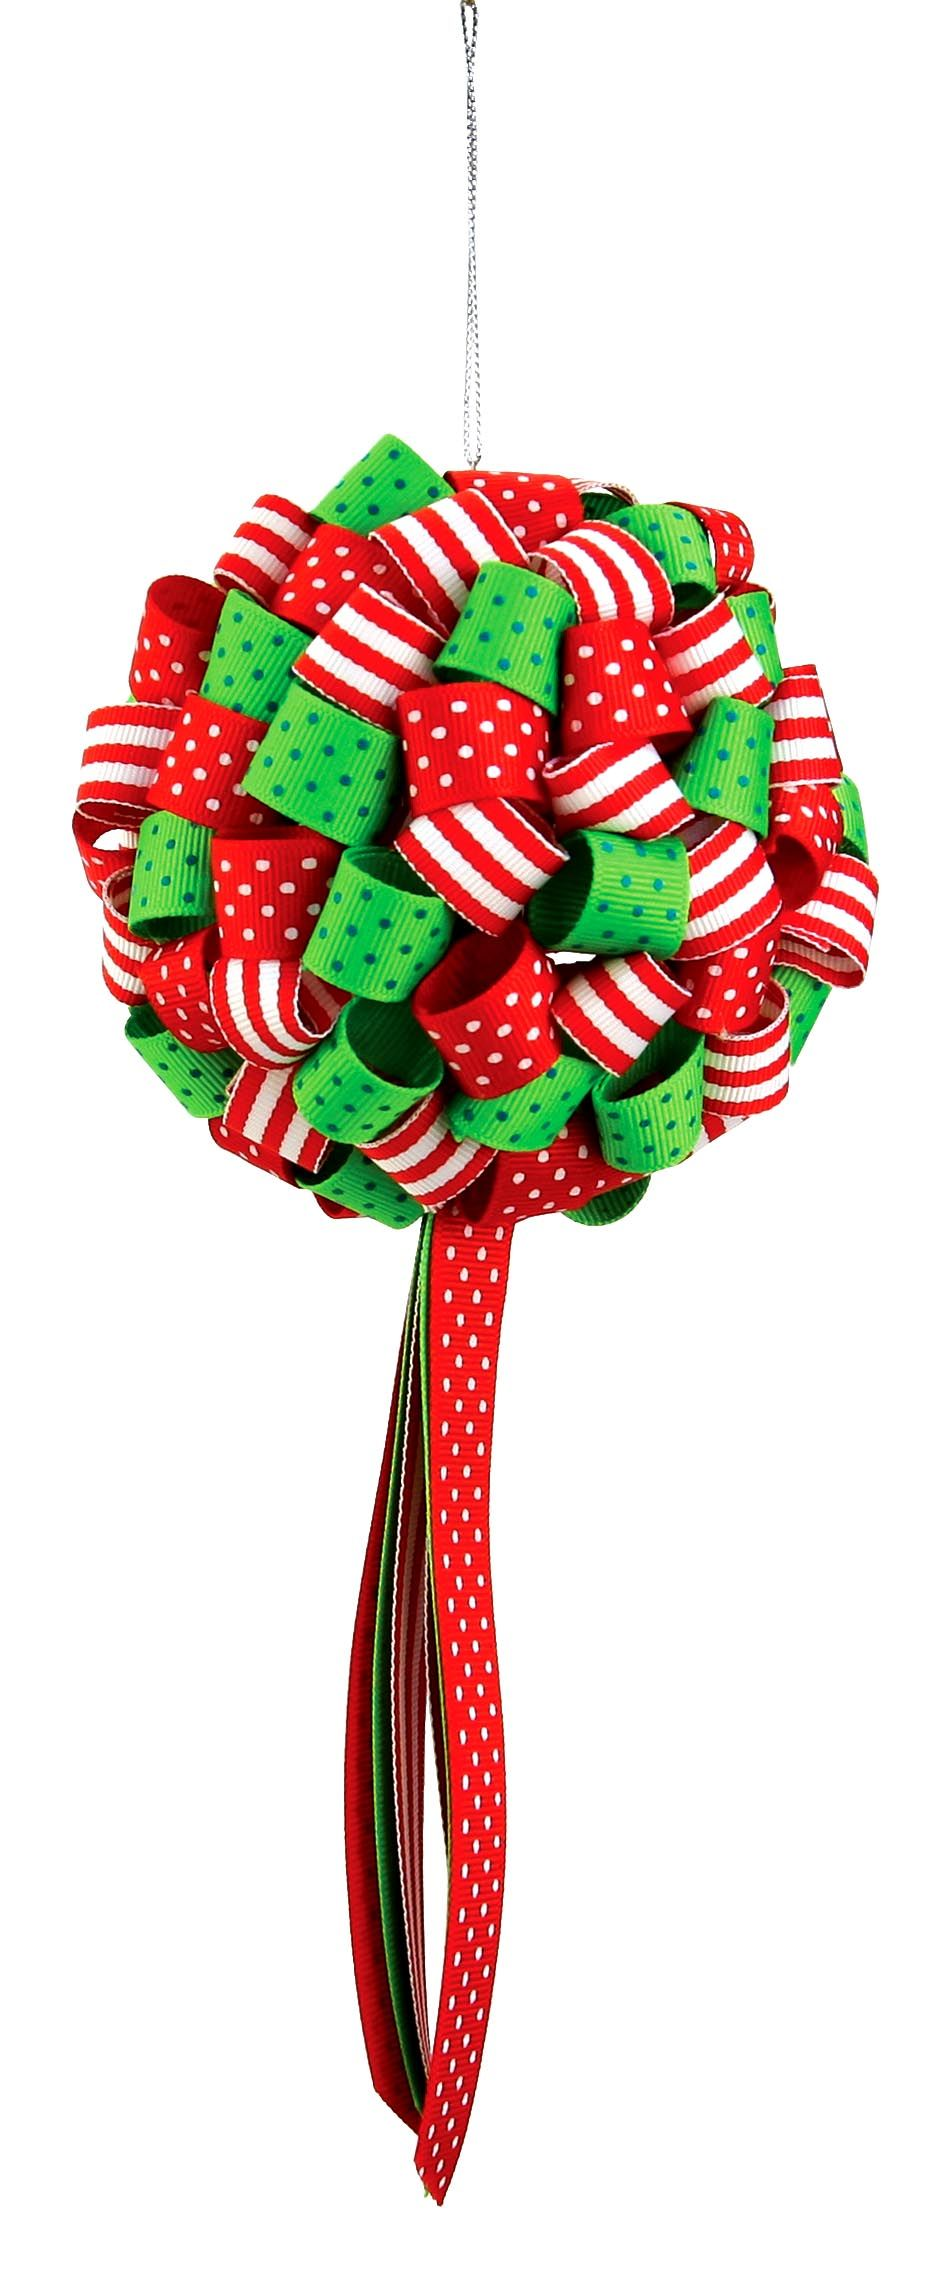 Nicole™ Crafts Ribbon Ornament #ornaments #craft #christmas #ribboncrafts